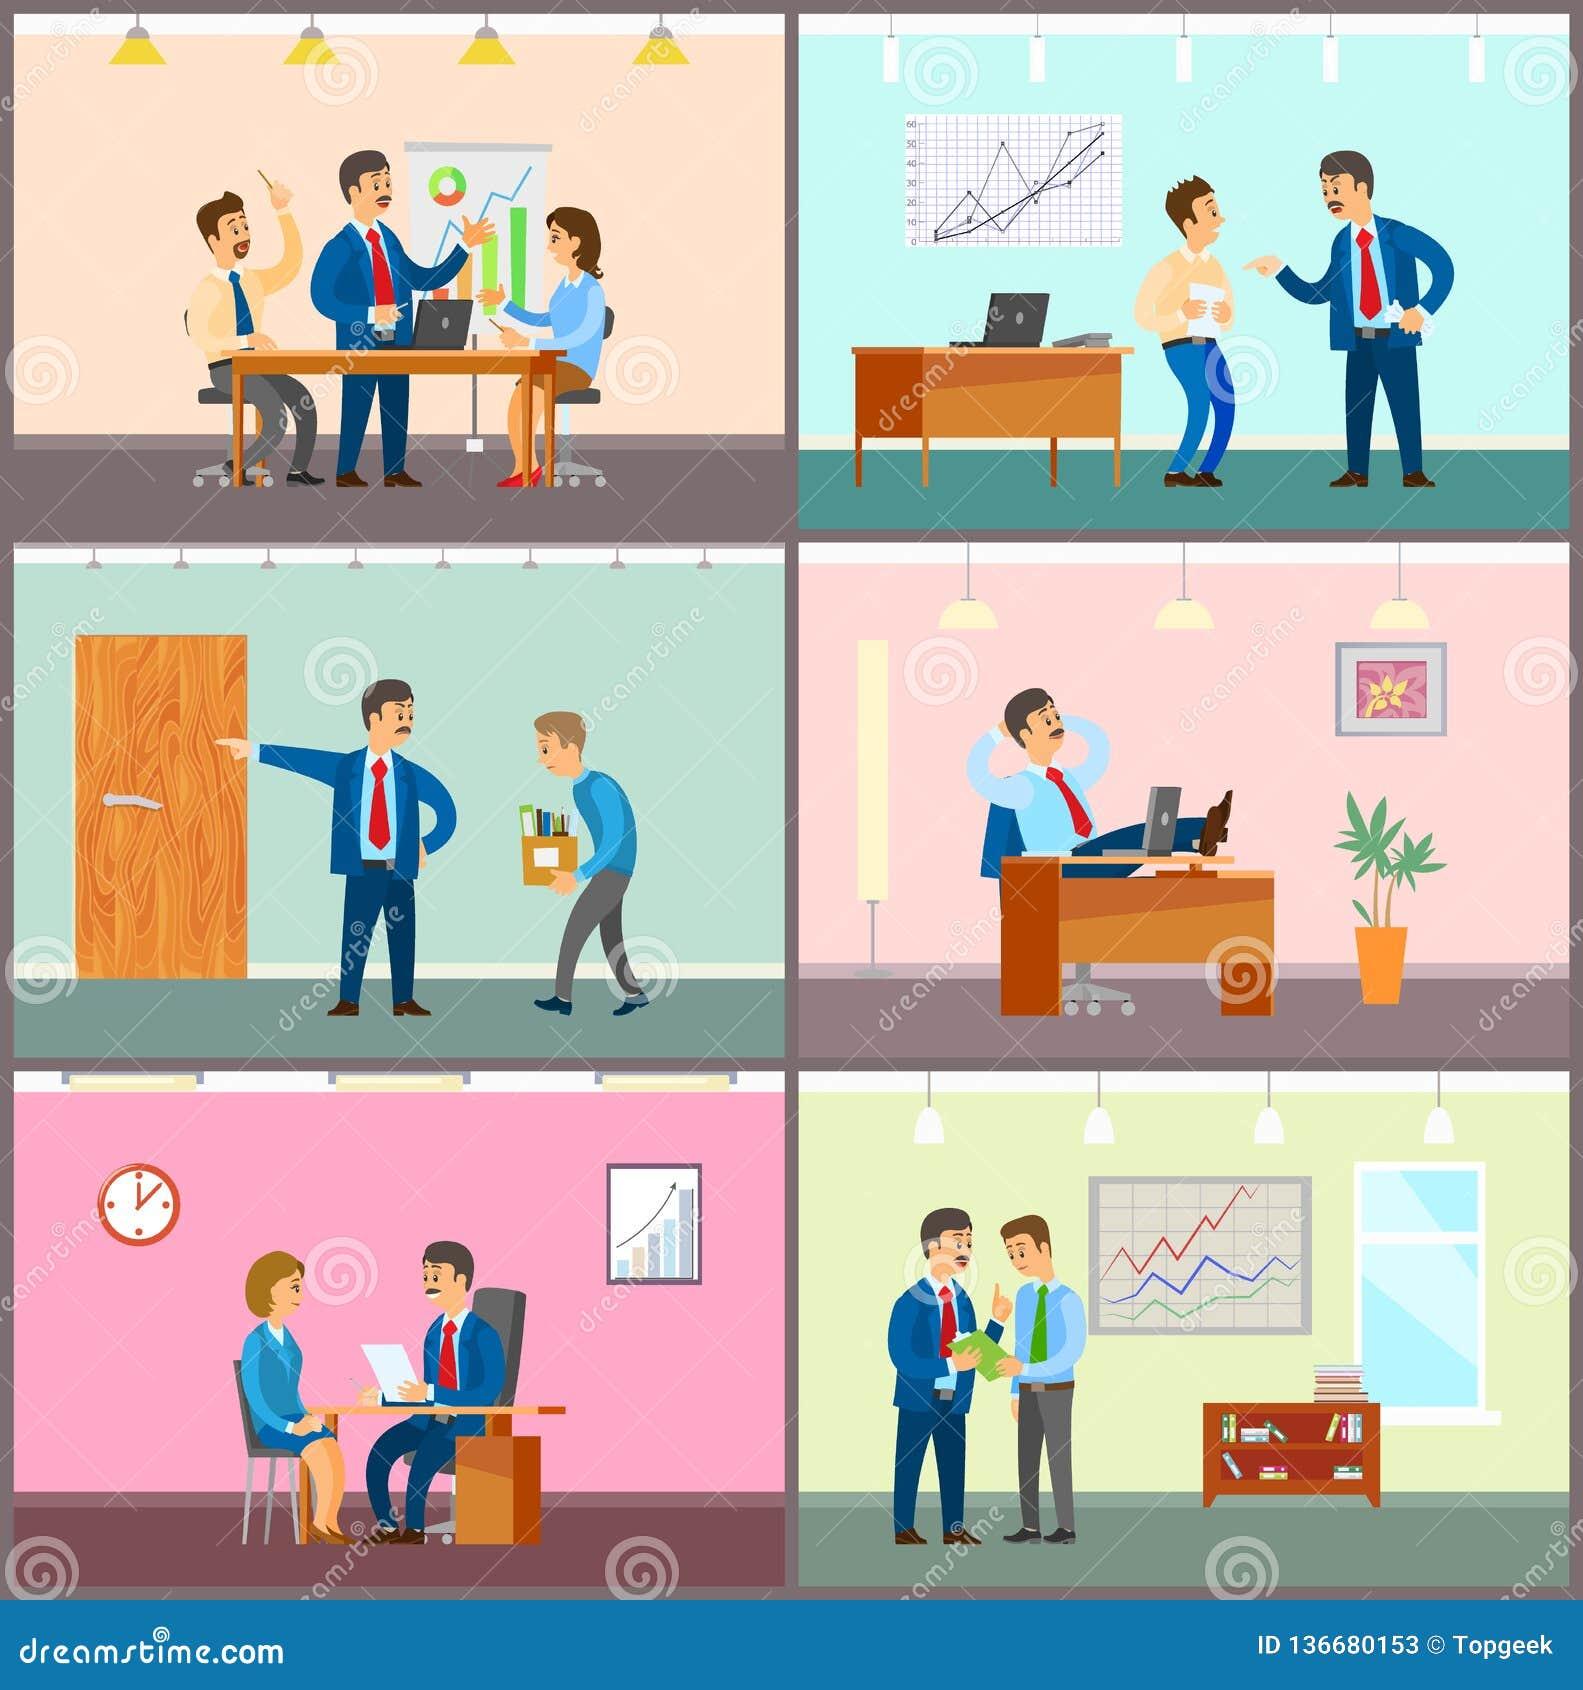 Business Meeting  Teamwork Brainstorming In Office Stock Vector